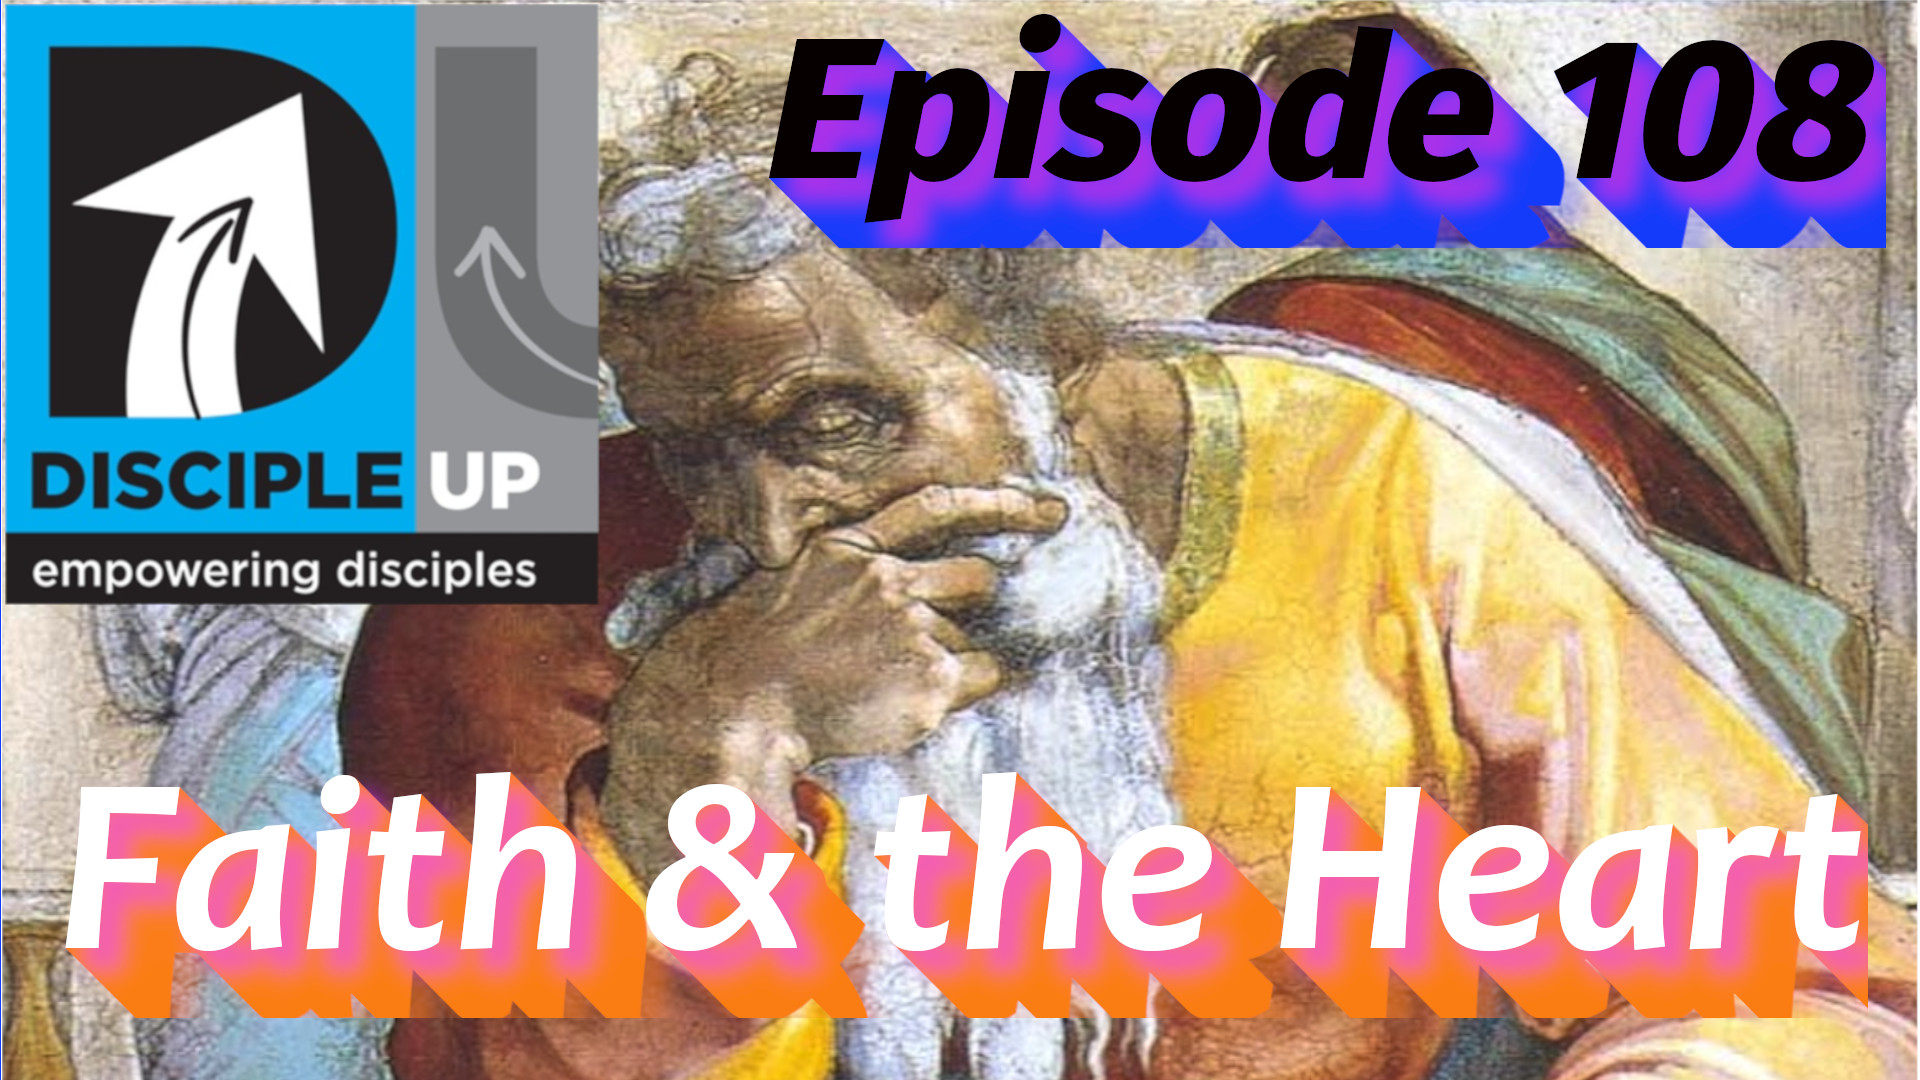 Episode 108